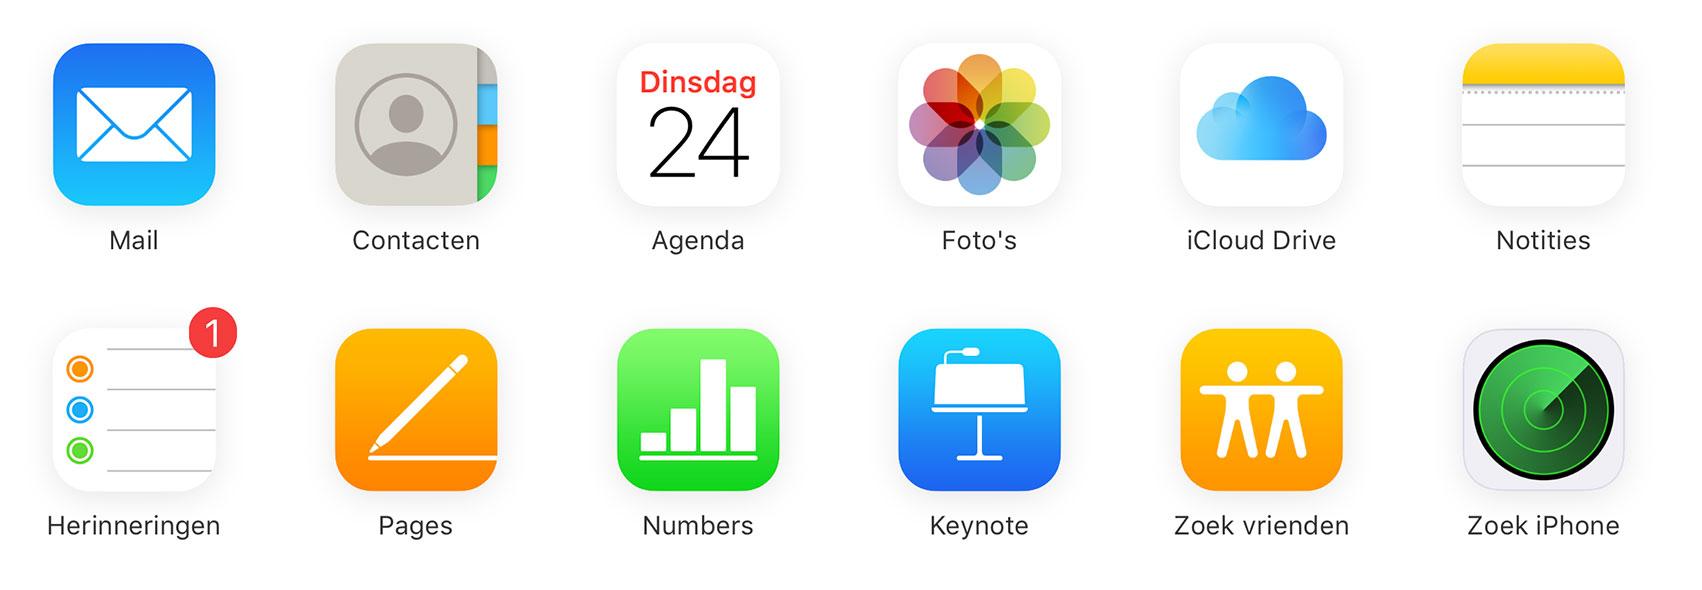 https://www.macfreak.nl/modules/news/images/zArt.iCloudWebpageIcons.jpg